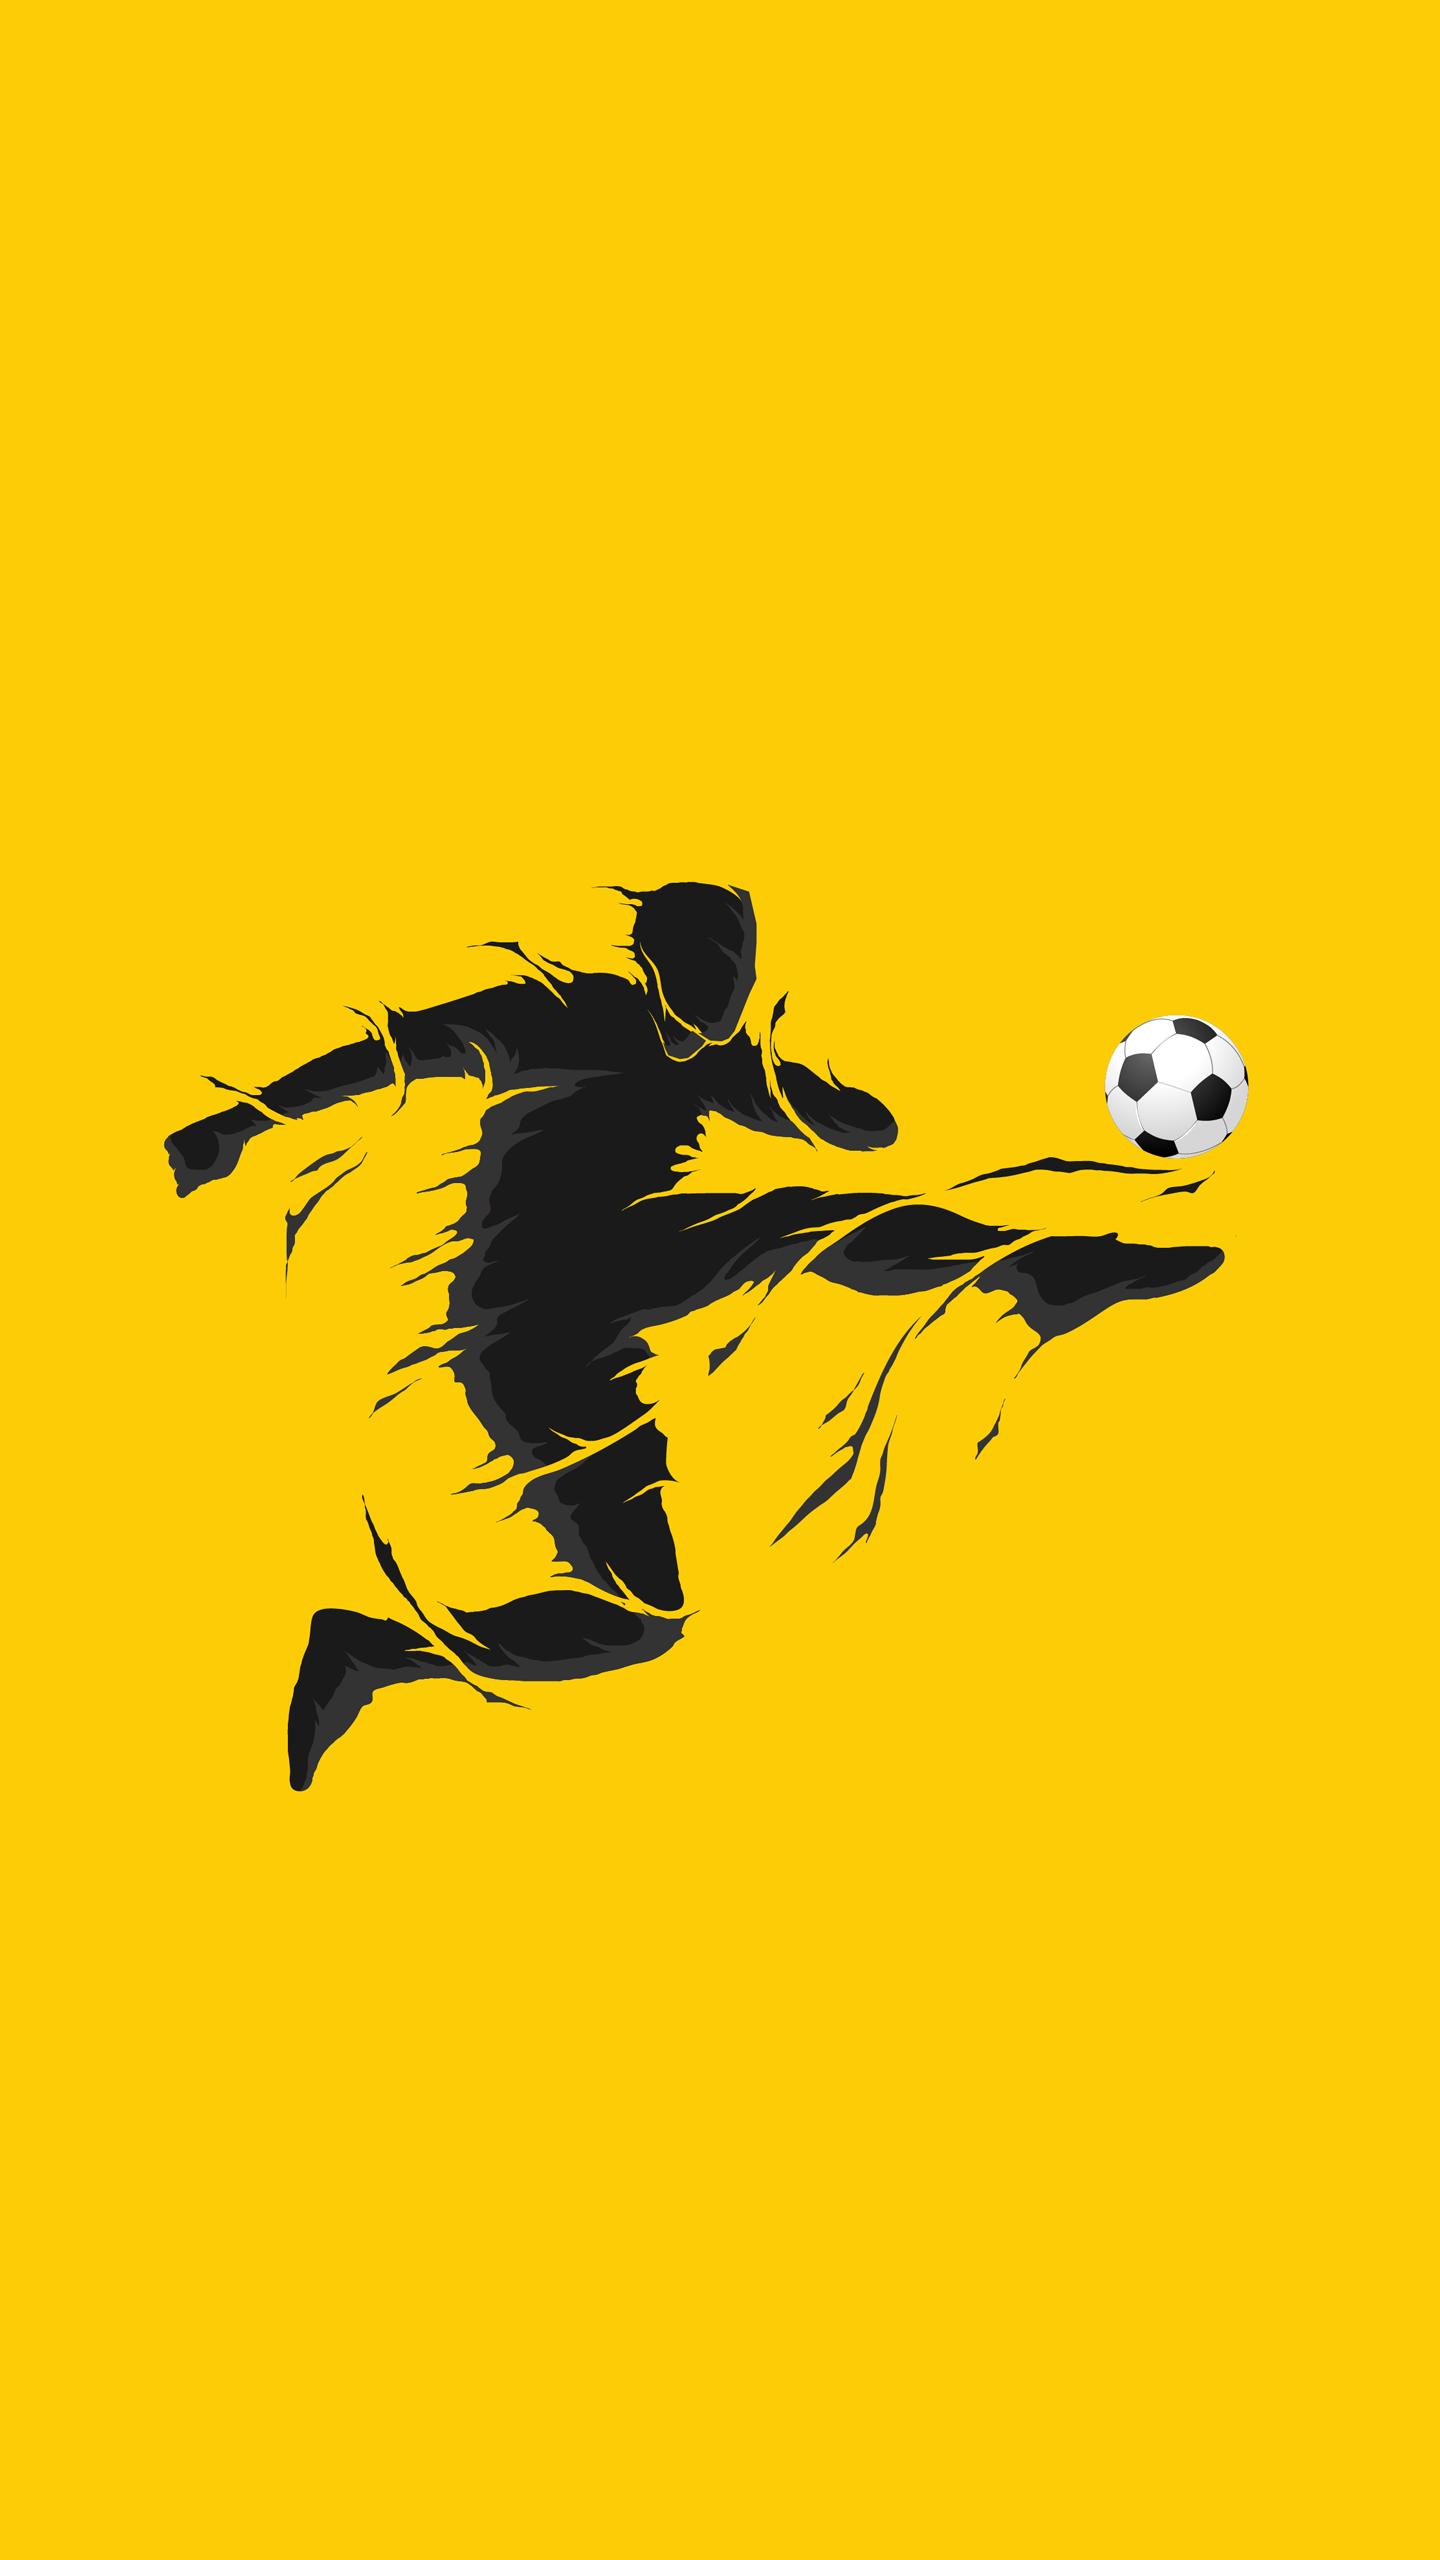 Cool Oregon Ducks Wallpaper Hd In 2020 Football Wallpaper Sports Wallpapers Soccer Ball